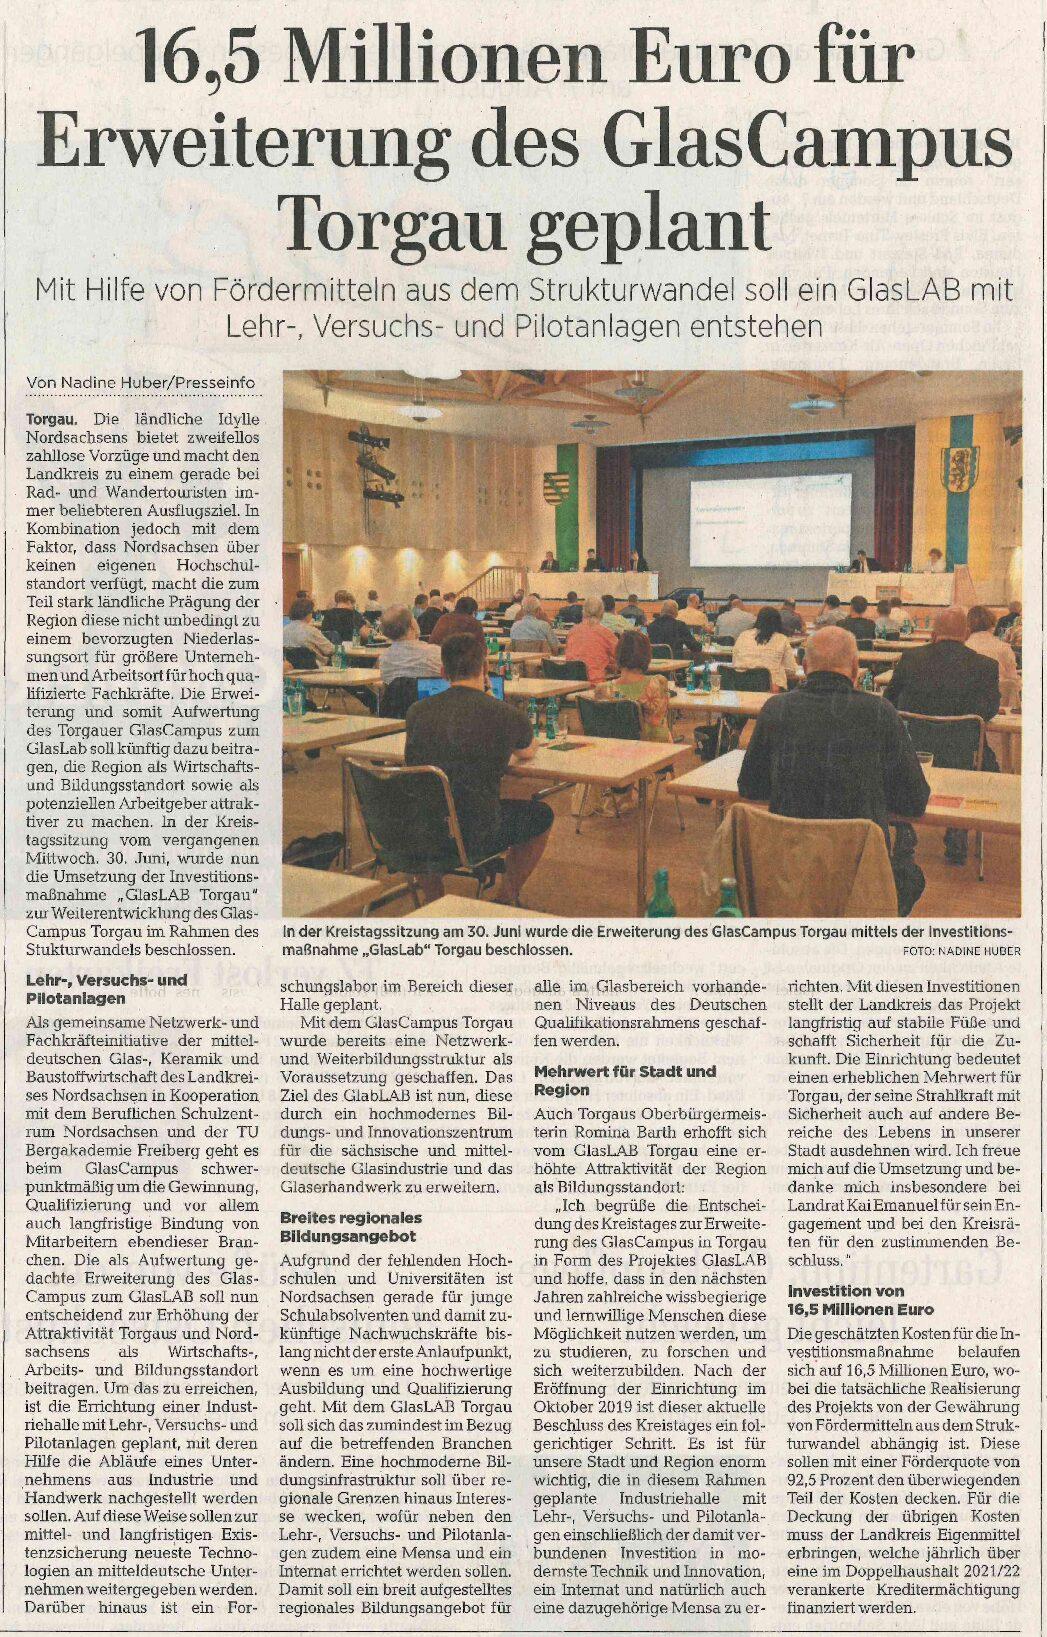 https://www.glascampus.de/wp-content/uploads/2021/07/210702_Presse_TZ-pdf.jpg